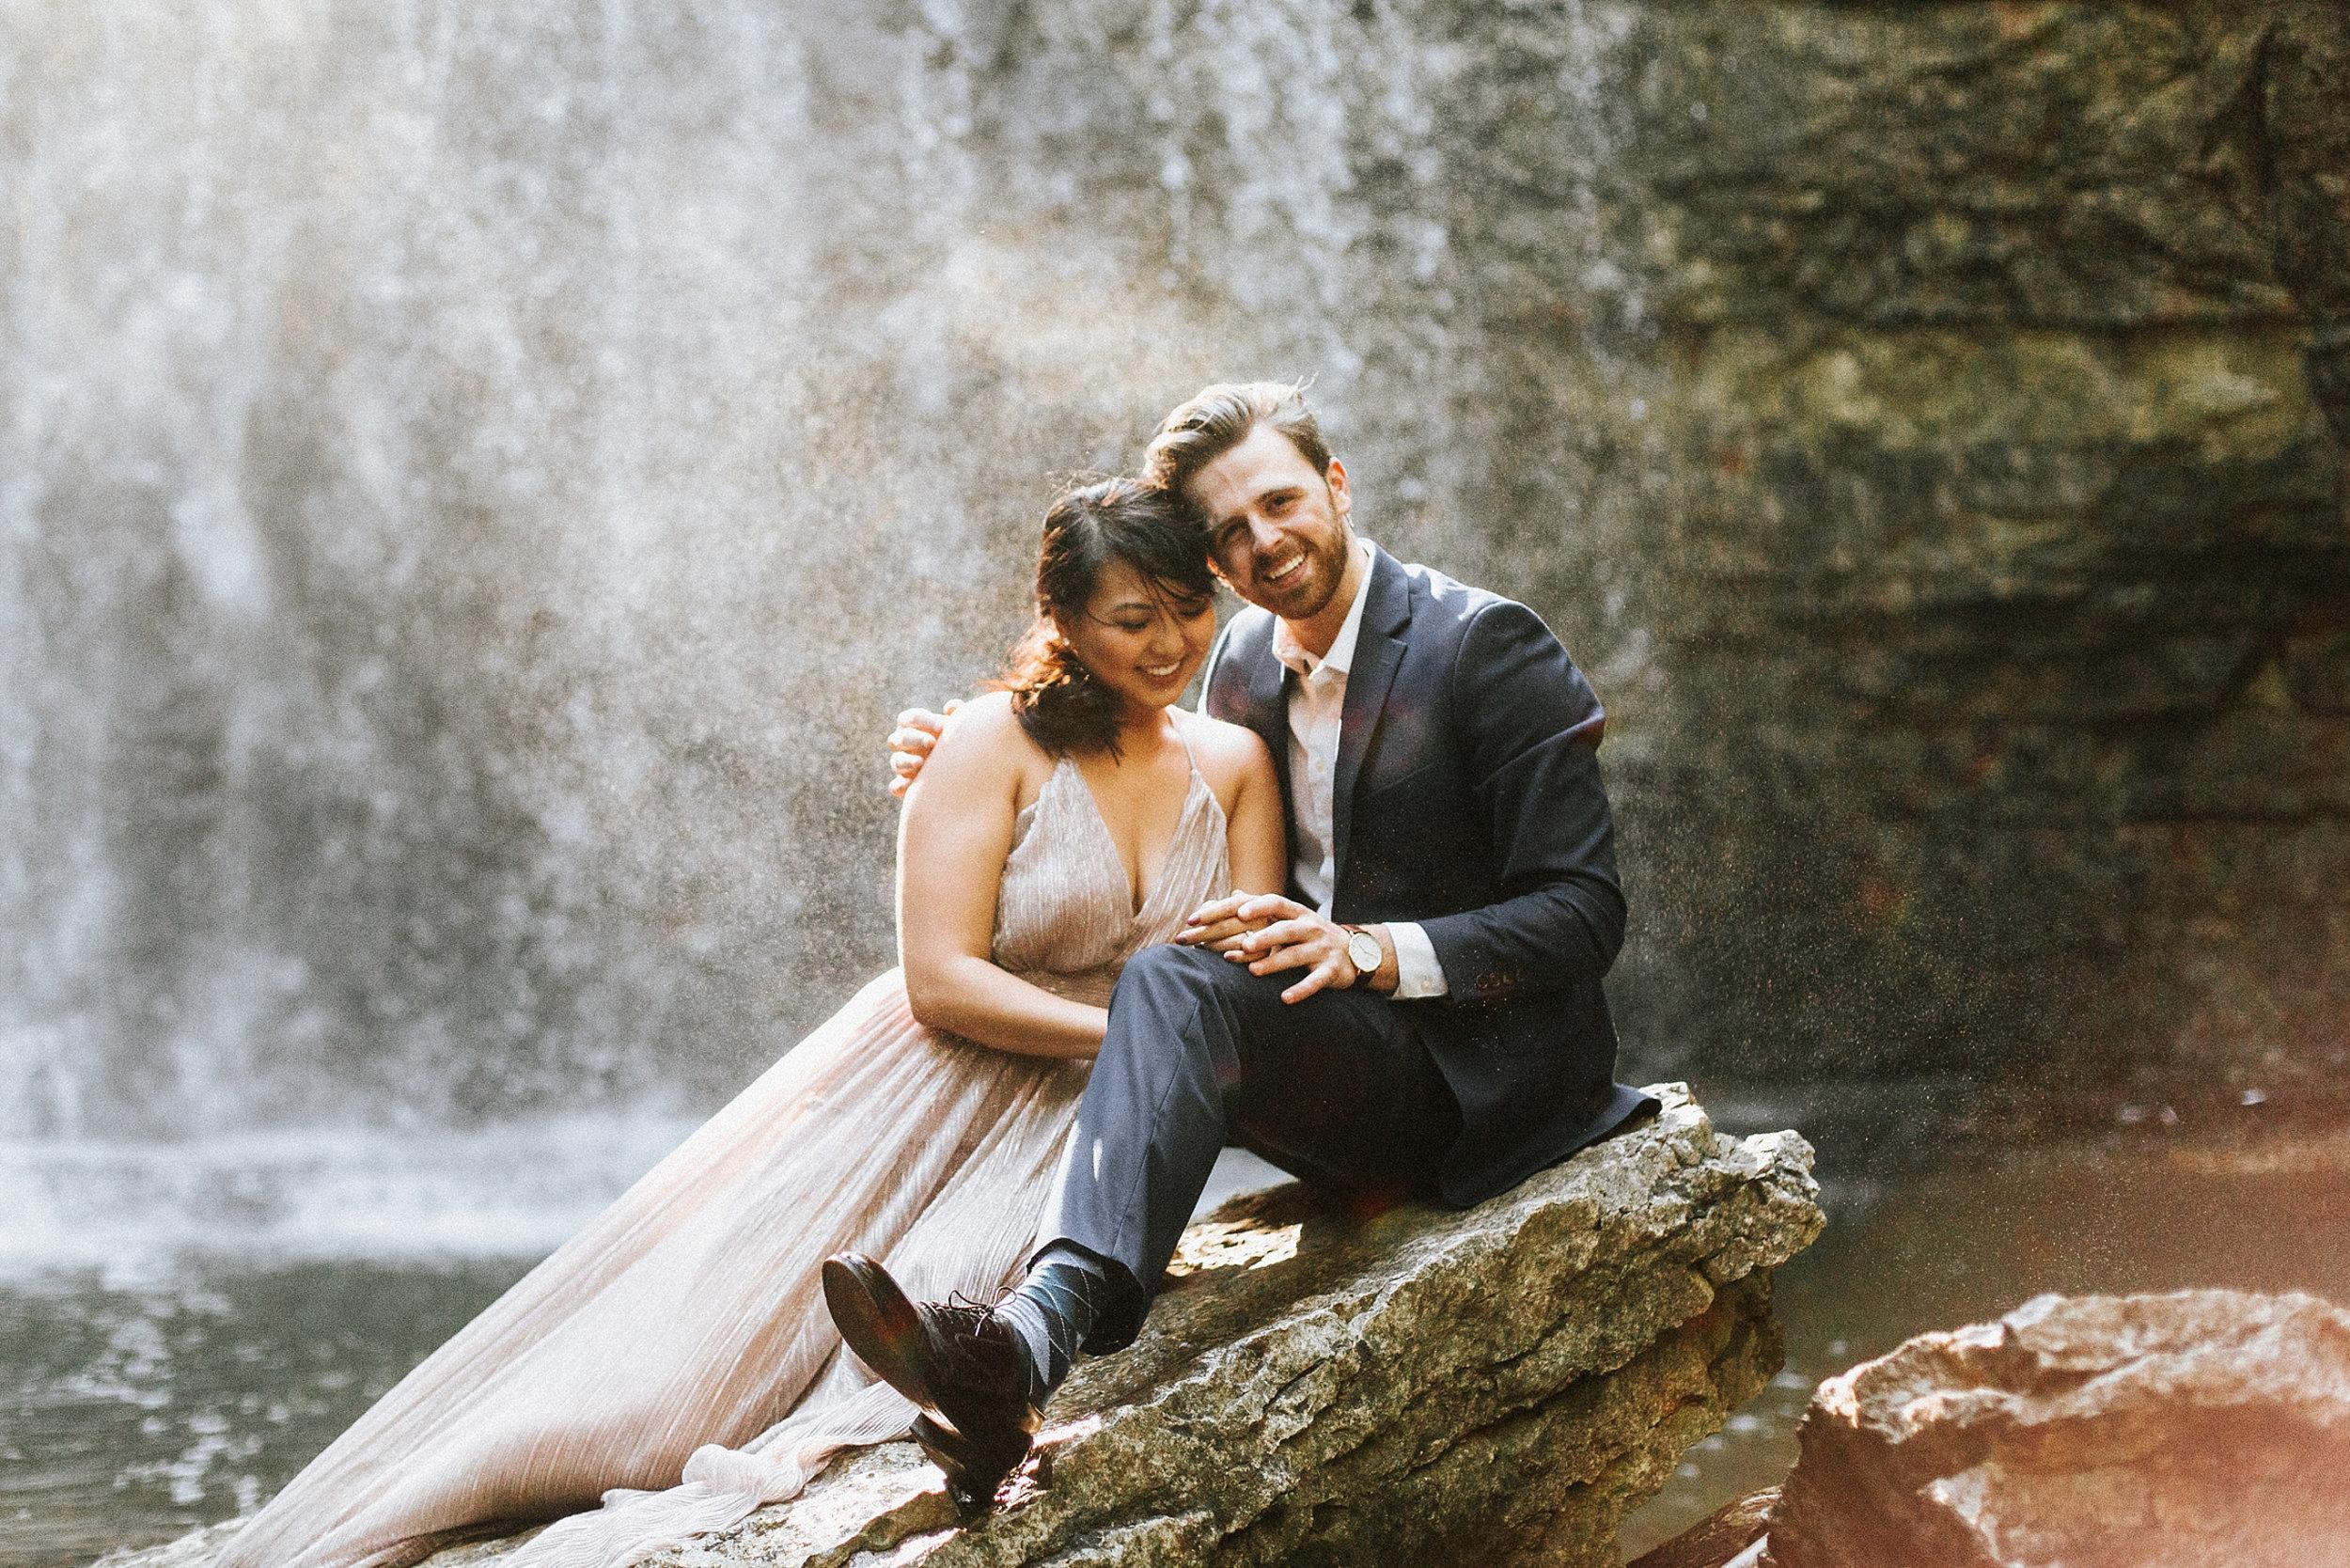 Brooke Townsend Photography - Ohio Wedding Photographer (11 of 70).jpg